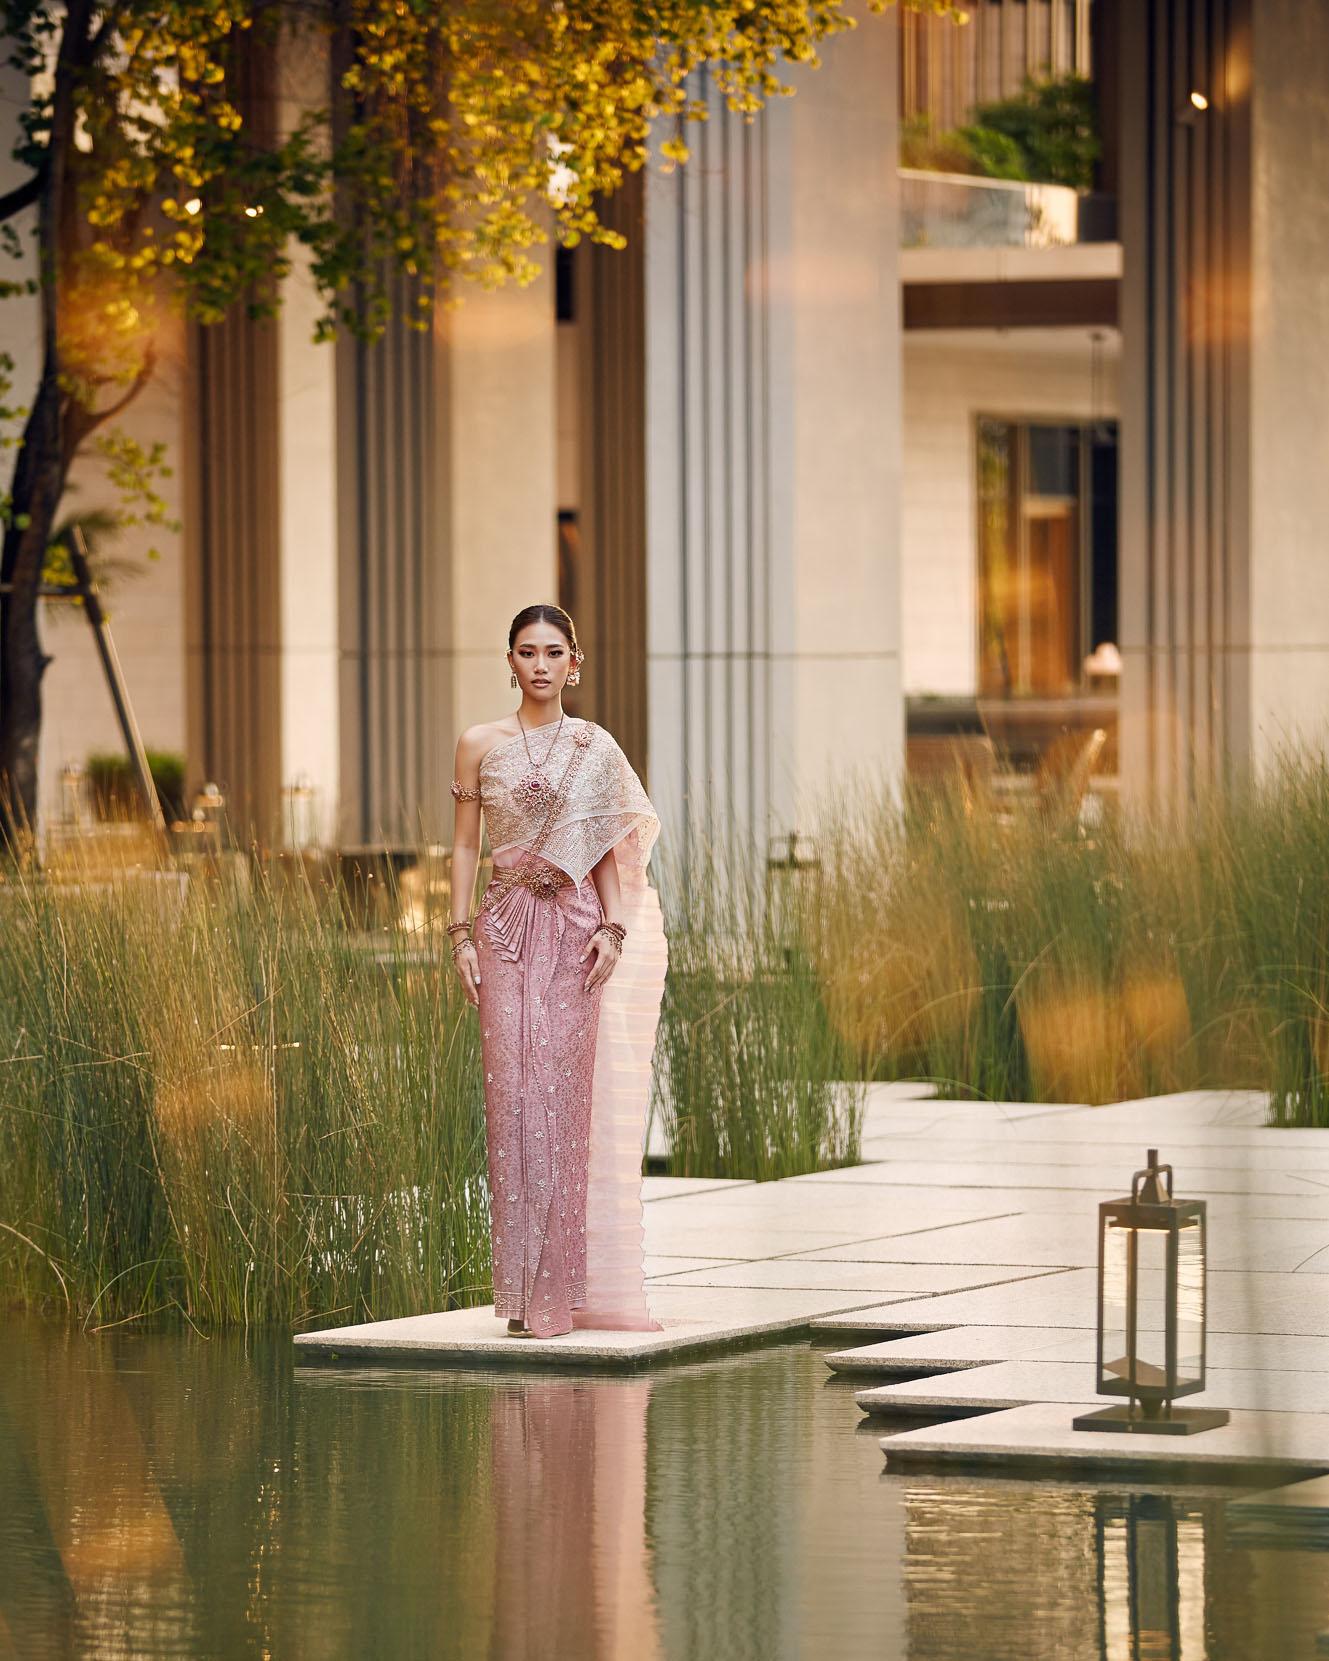 Thai traditional dress - Pleng 09